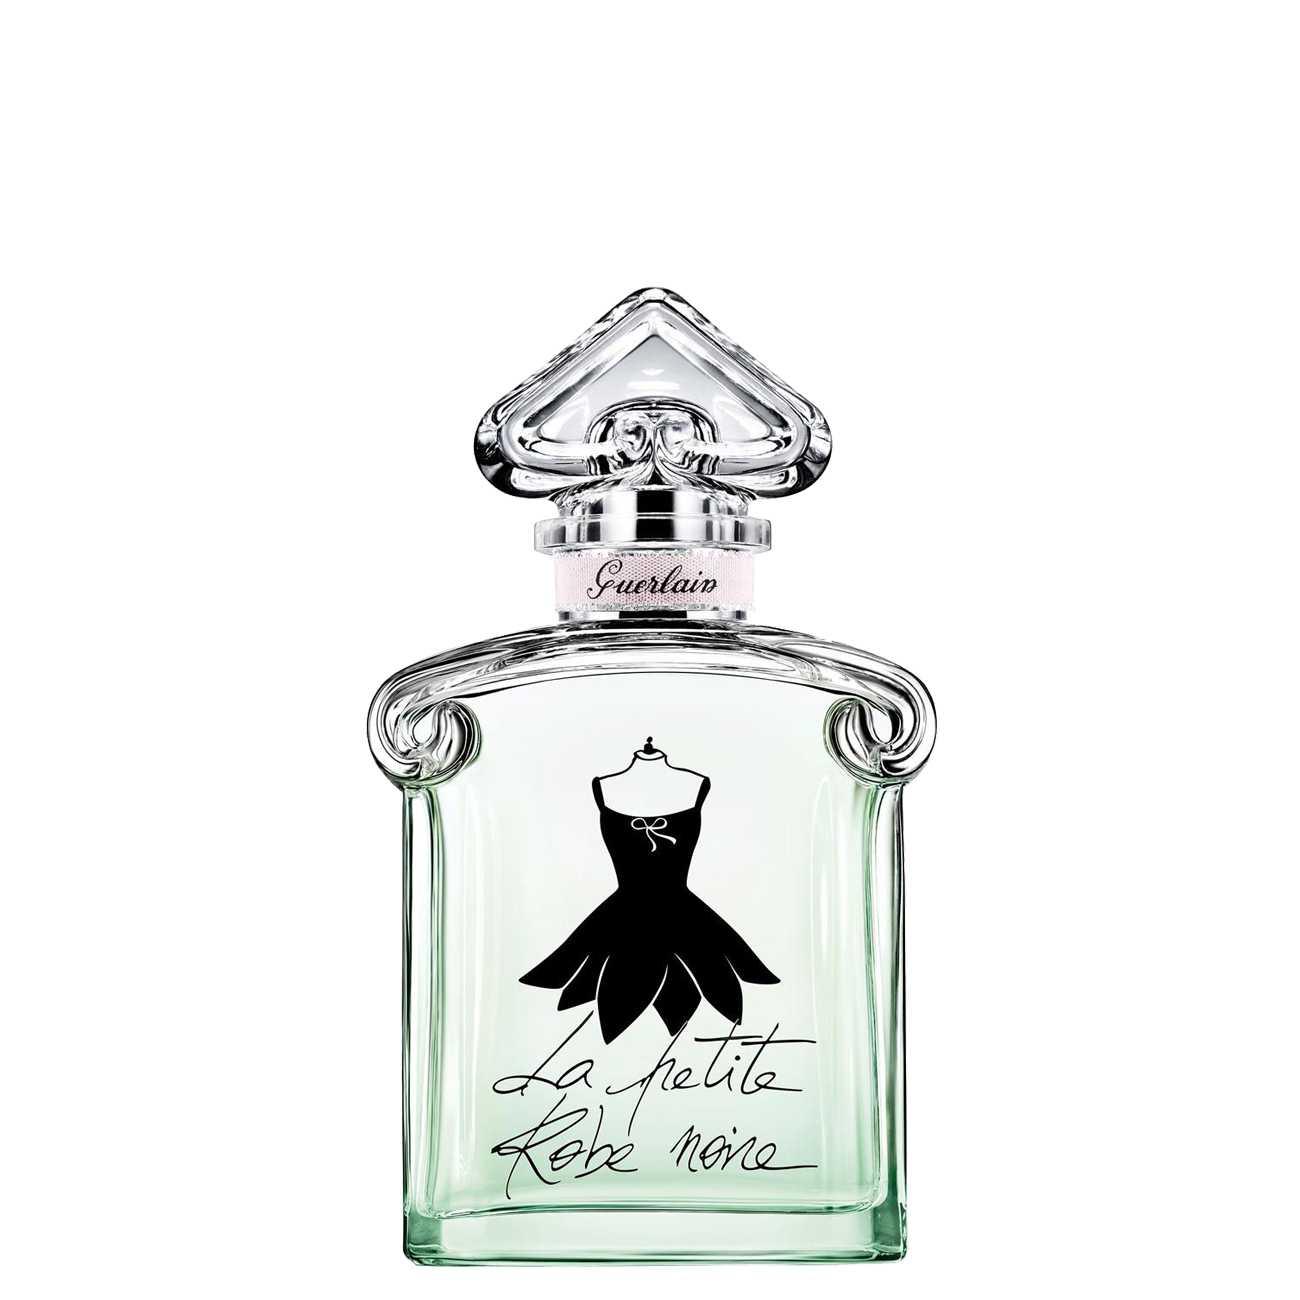 La Petite Robe Noire Eau Fraiche 75 Ml 75ml Guerlain imagine 2021 bestvalue.eu